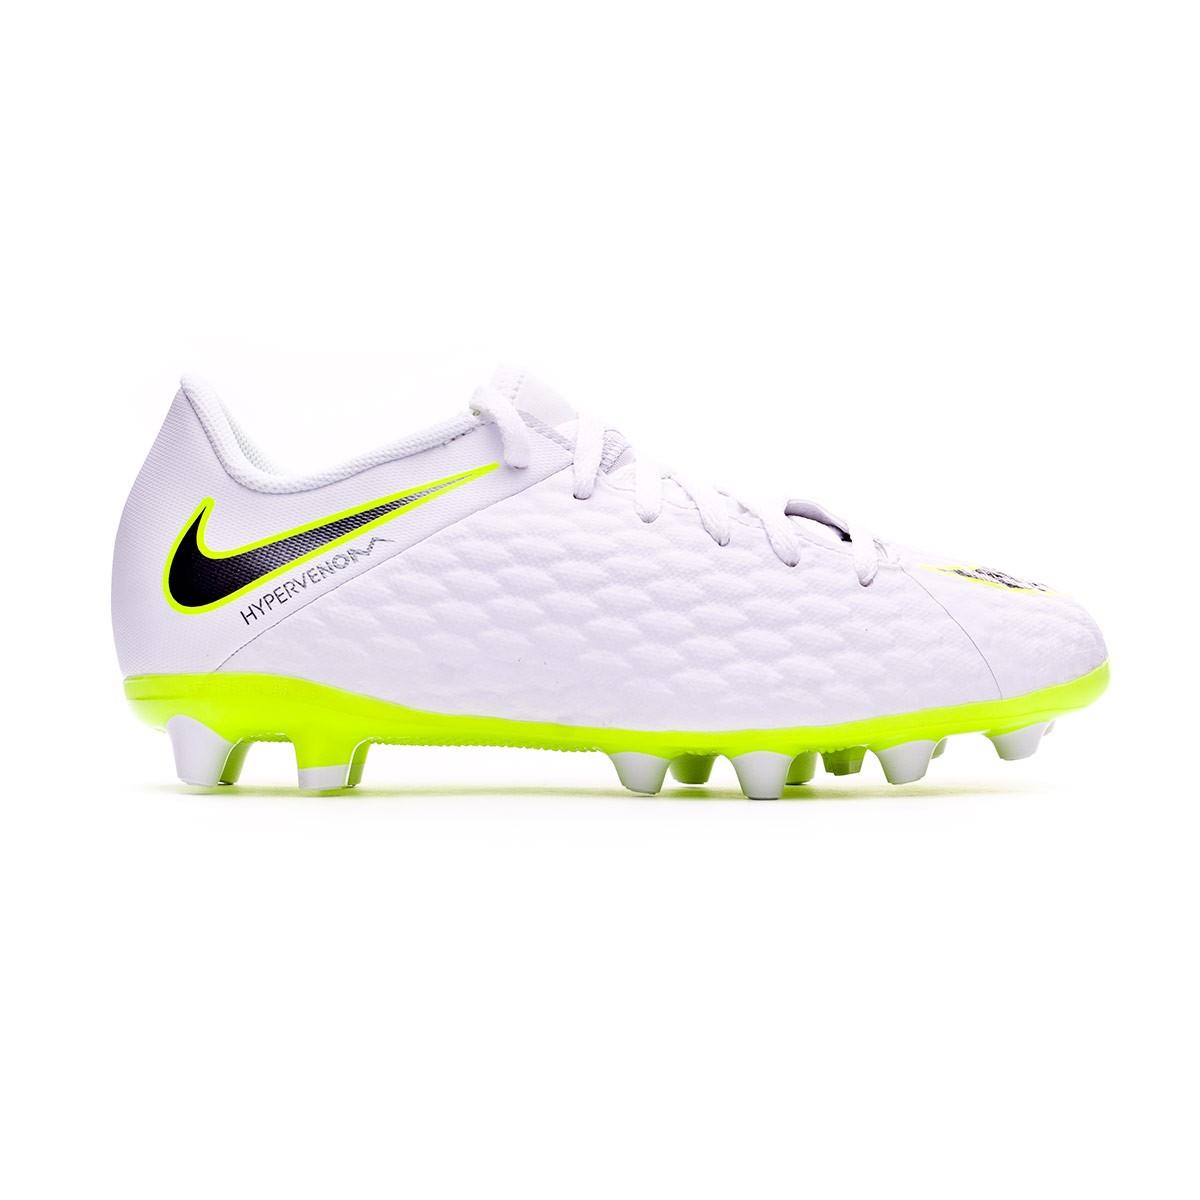 Categorías de la Bota de fútbol. Botas de fútbol · Botas de fútbol Nike · Nike  Hypervenom · Nike Hypervenom Phantom Academy ce5c0ffff2b99